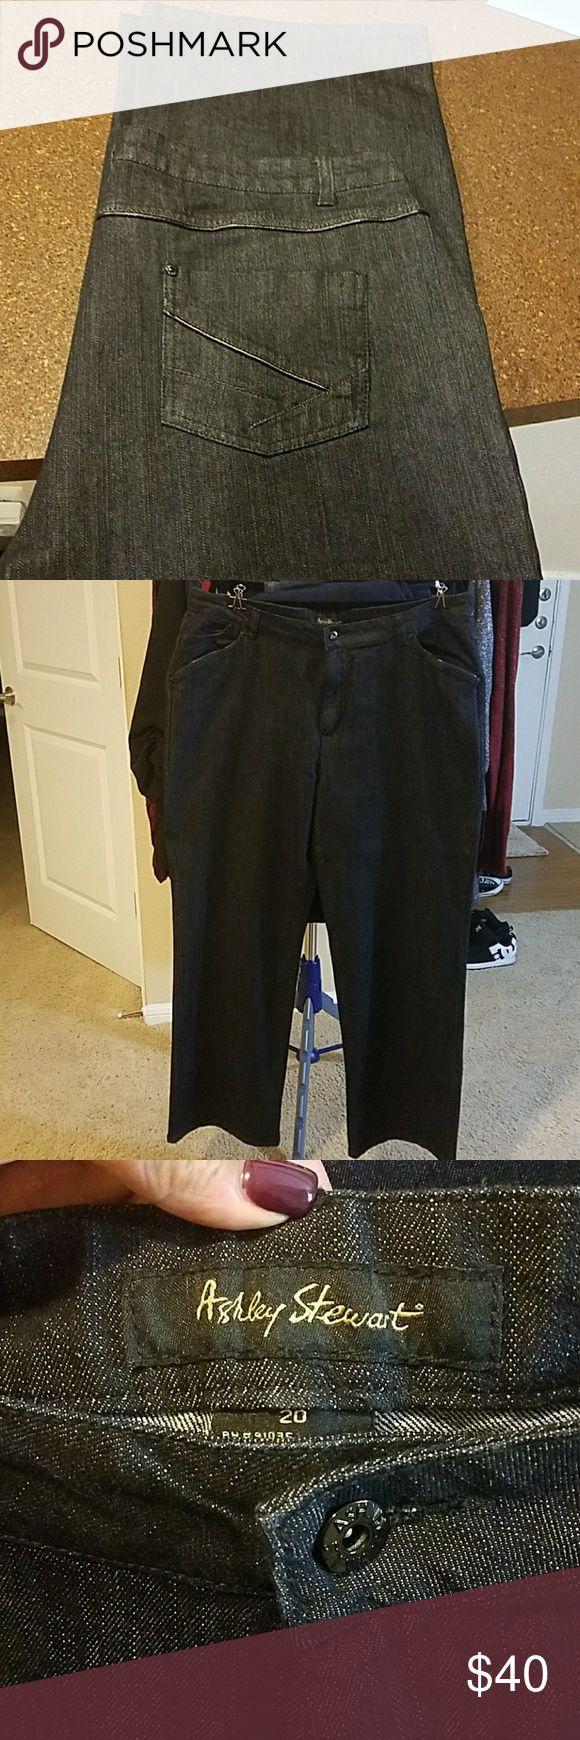 Darkest Rinse straight cut jeans Very nearly black jeans, never worn Ashley Stewart Jeans Straight Leg